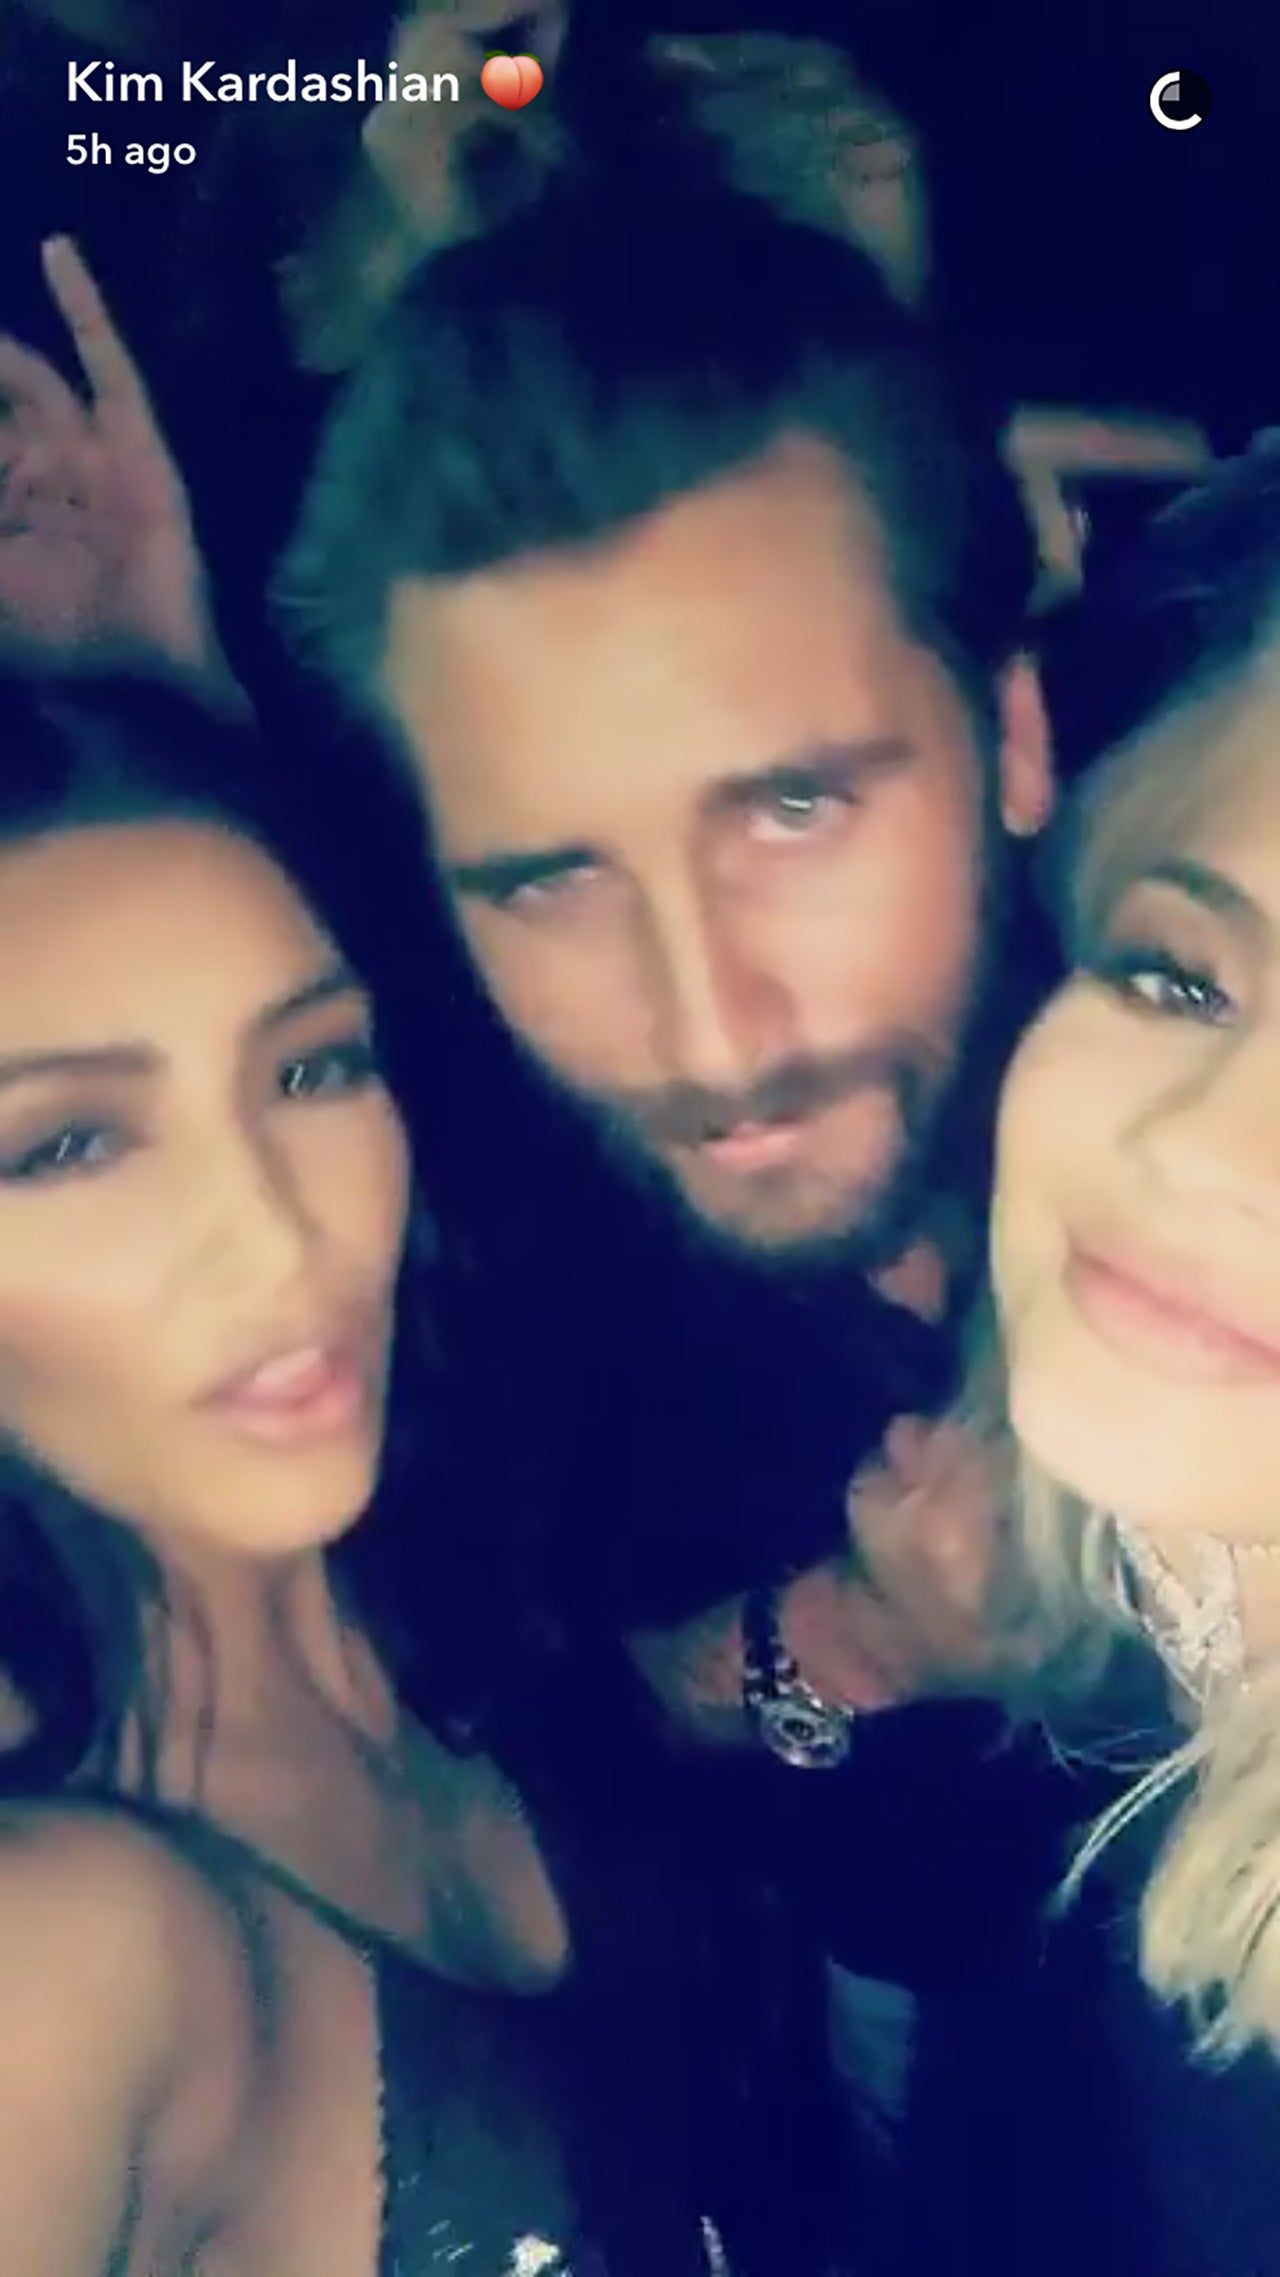 Kim Kardashian Scott Disick And Kylie And Kendall Jenner